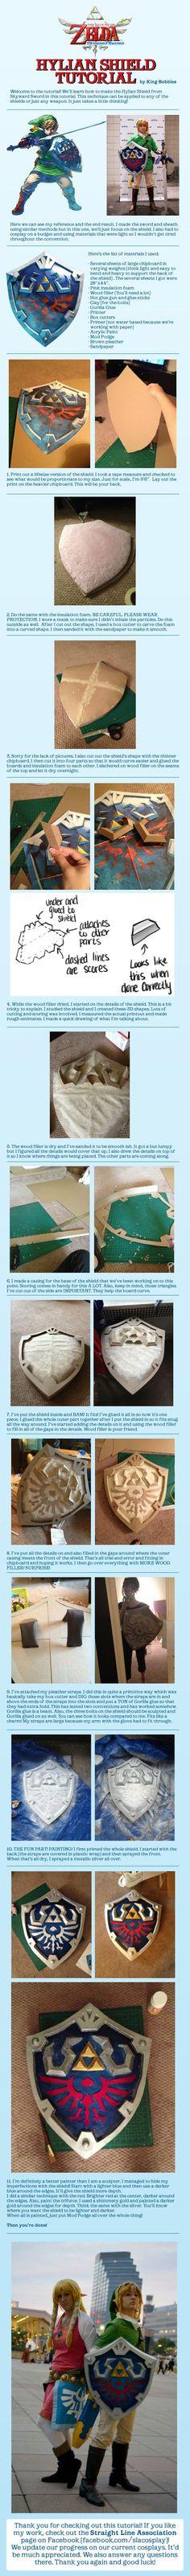 How to make Skyward Sword Hylian Shield